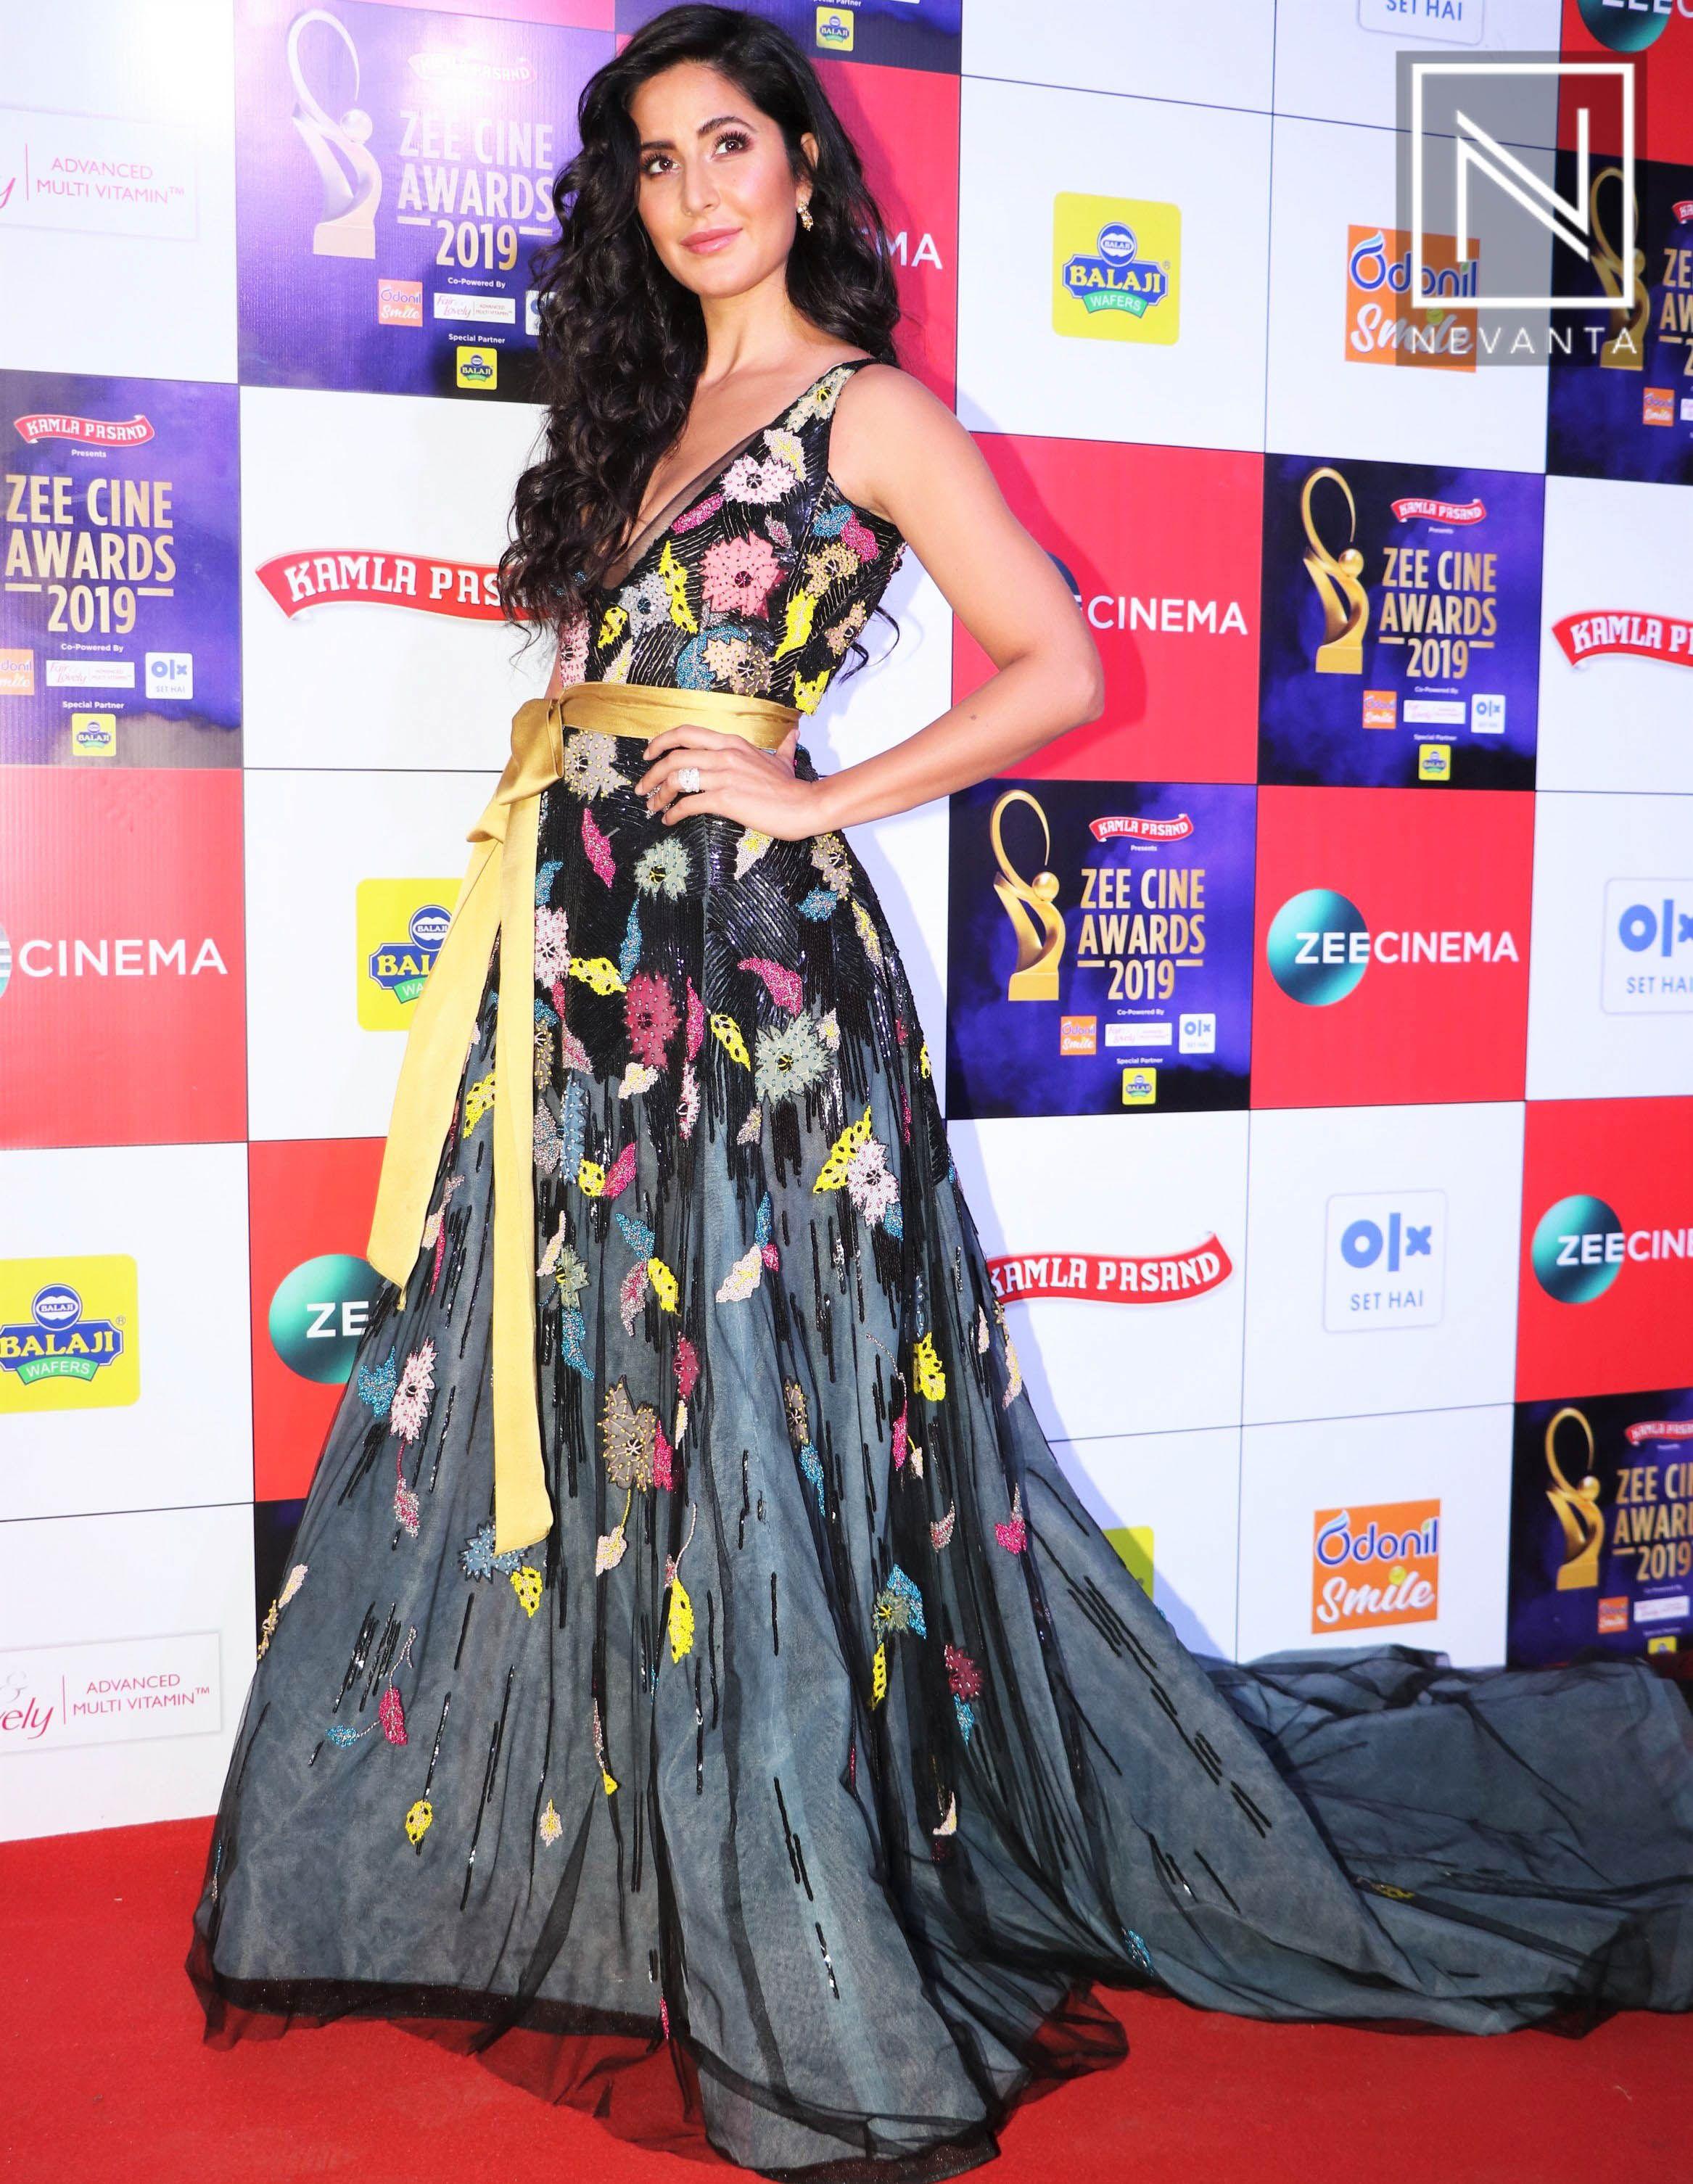 Katrina Kaif Zee Cine Awards 2019 Bollywood Fashion Gowns Red Saree Blouse